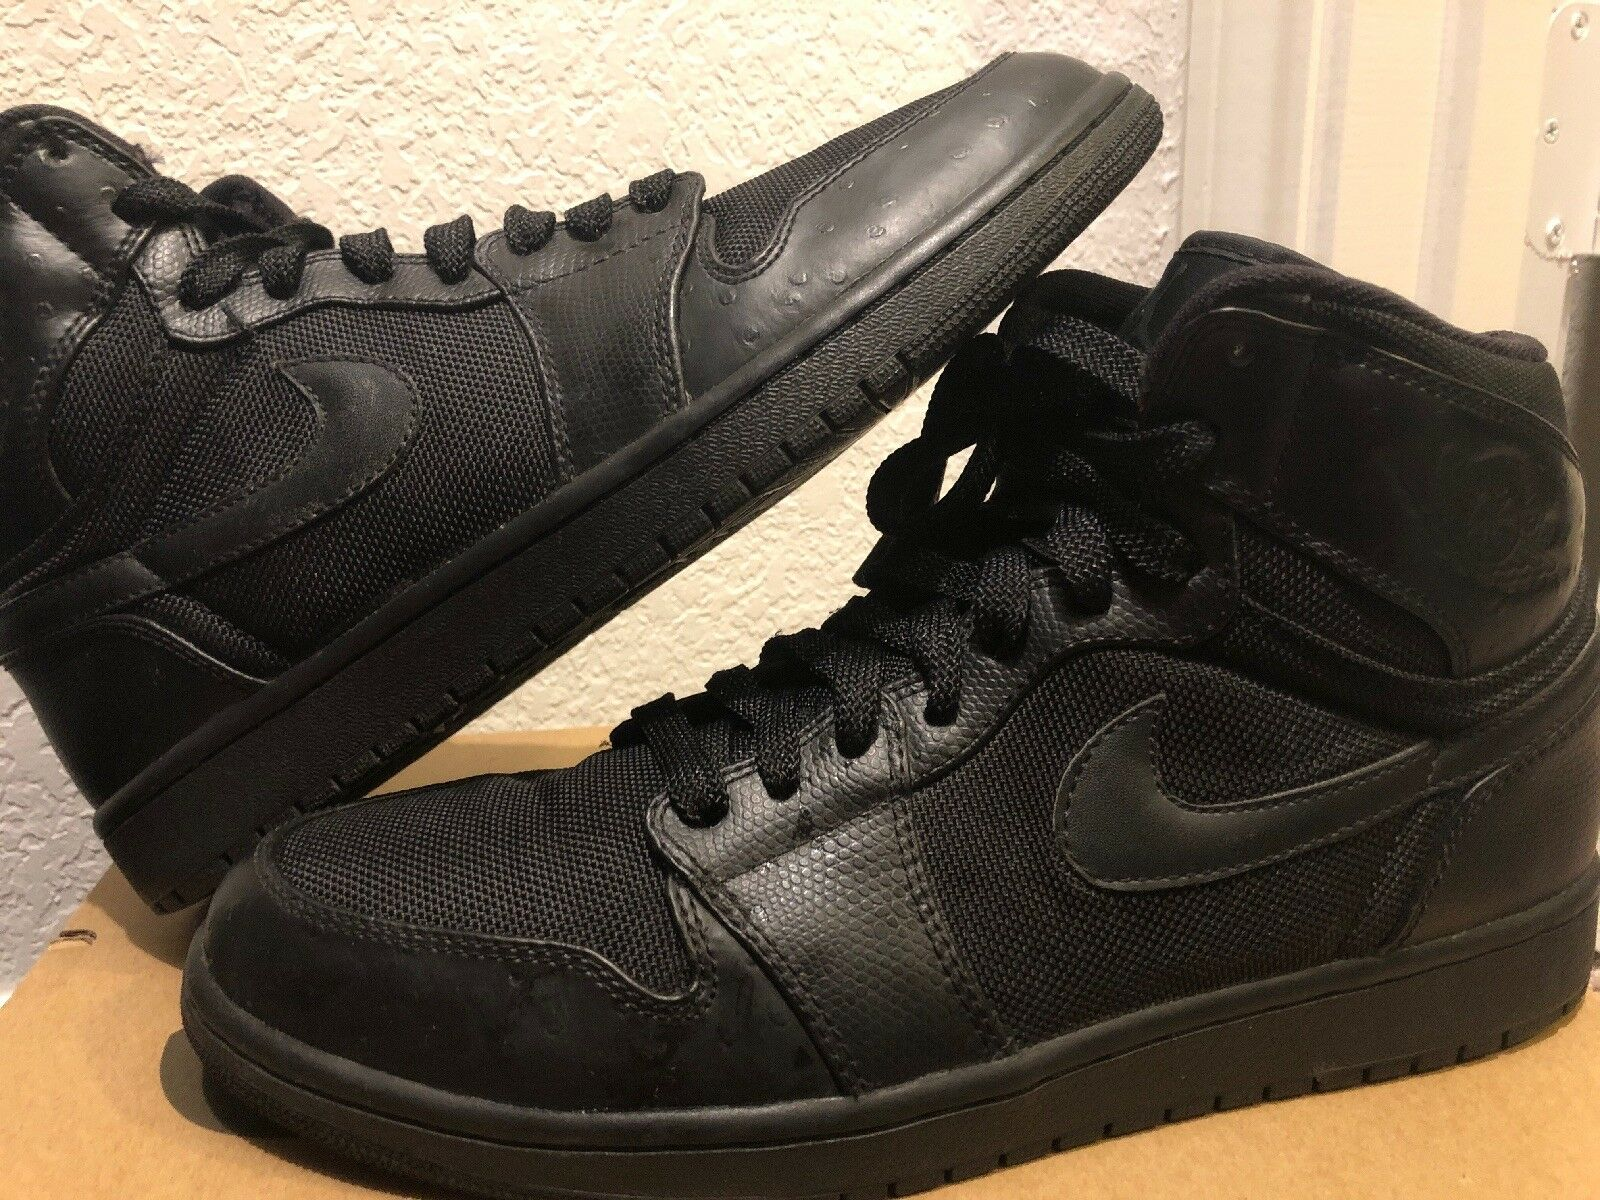 Nike Air Jordan 1 SIze 10 Triple Black 332550-002 2008 used Mens